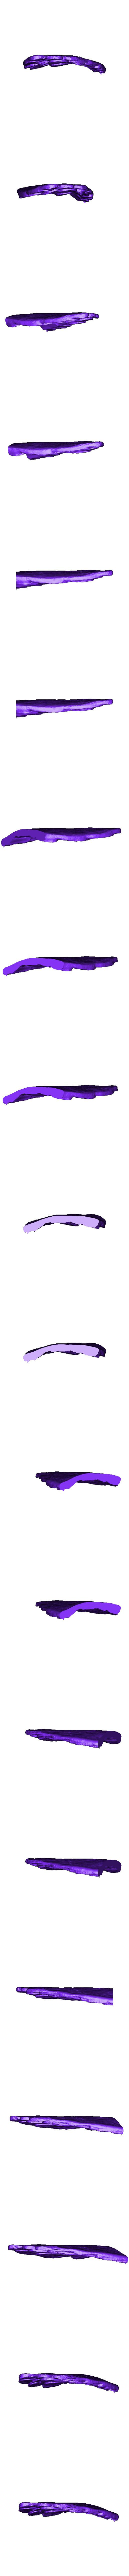 20131015WVwingL2.stl Download free OBJ file Winged Victory of Samothrace • 3D printable object, Ghashgar